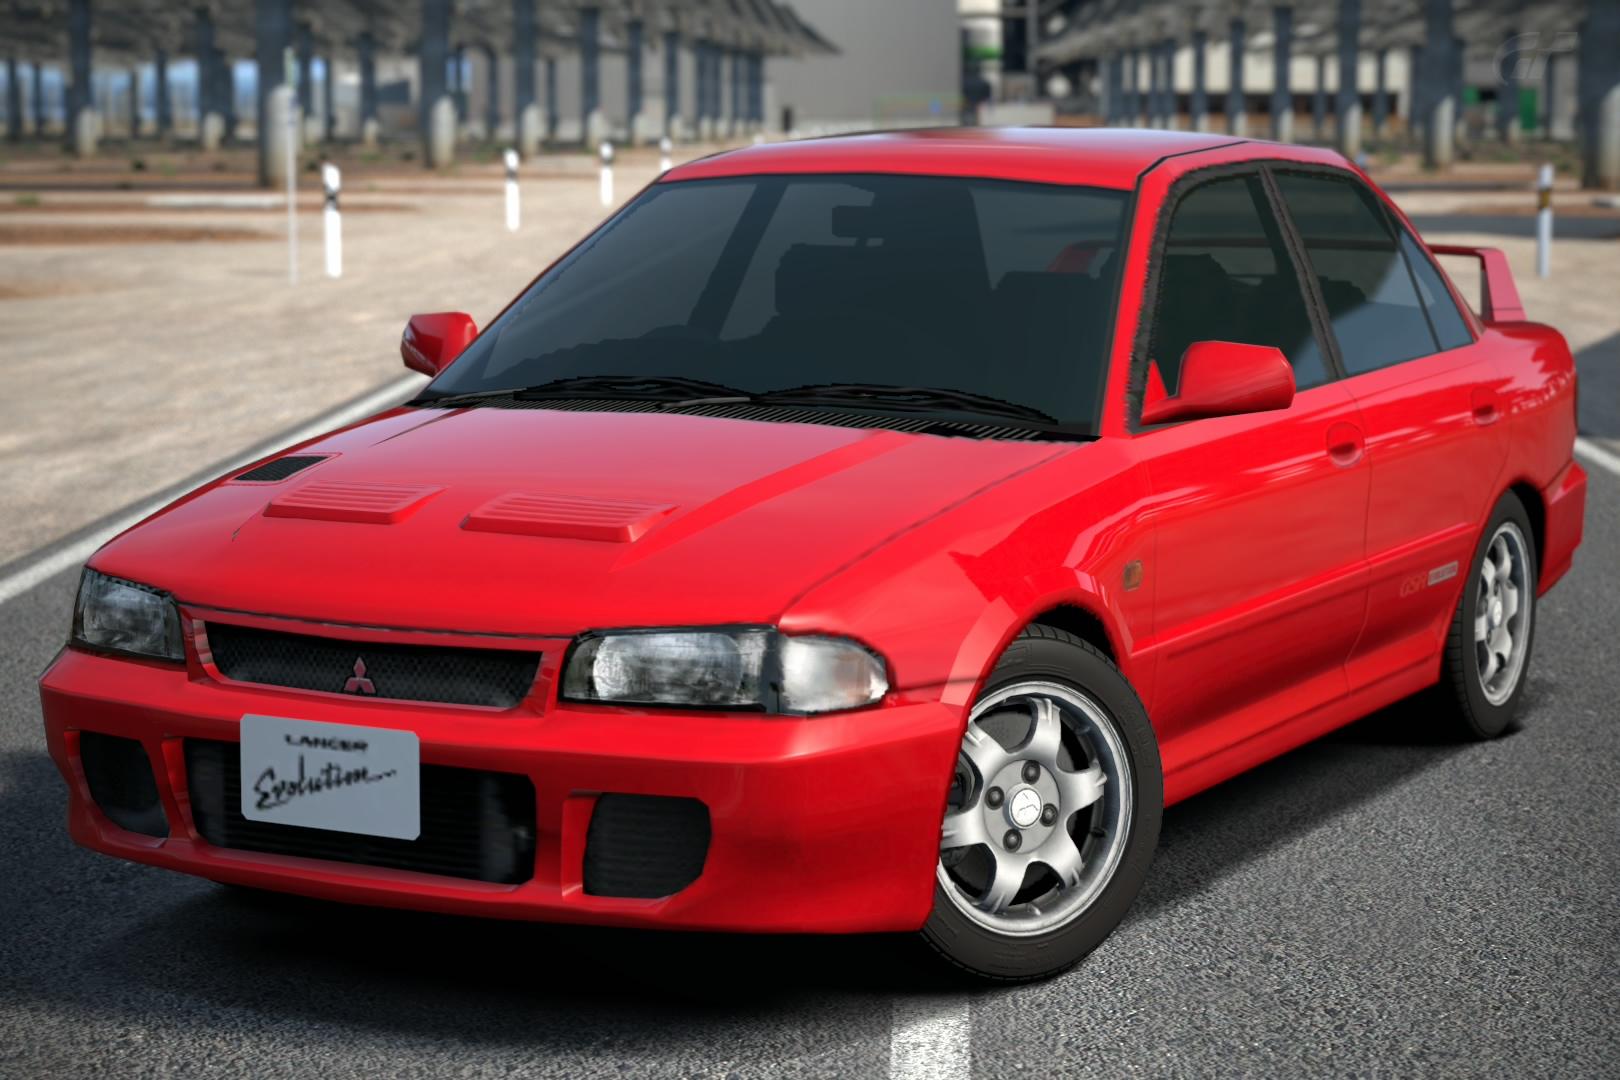 Mitsubishi Lancer Evolution GSR 92